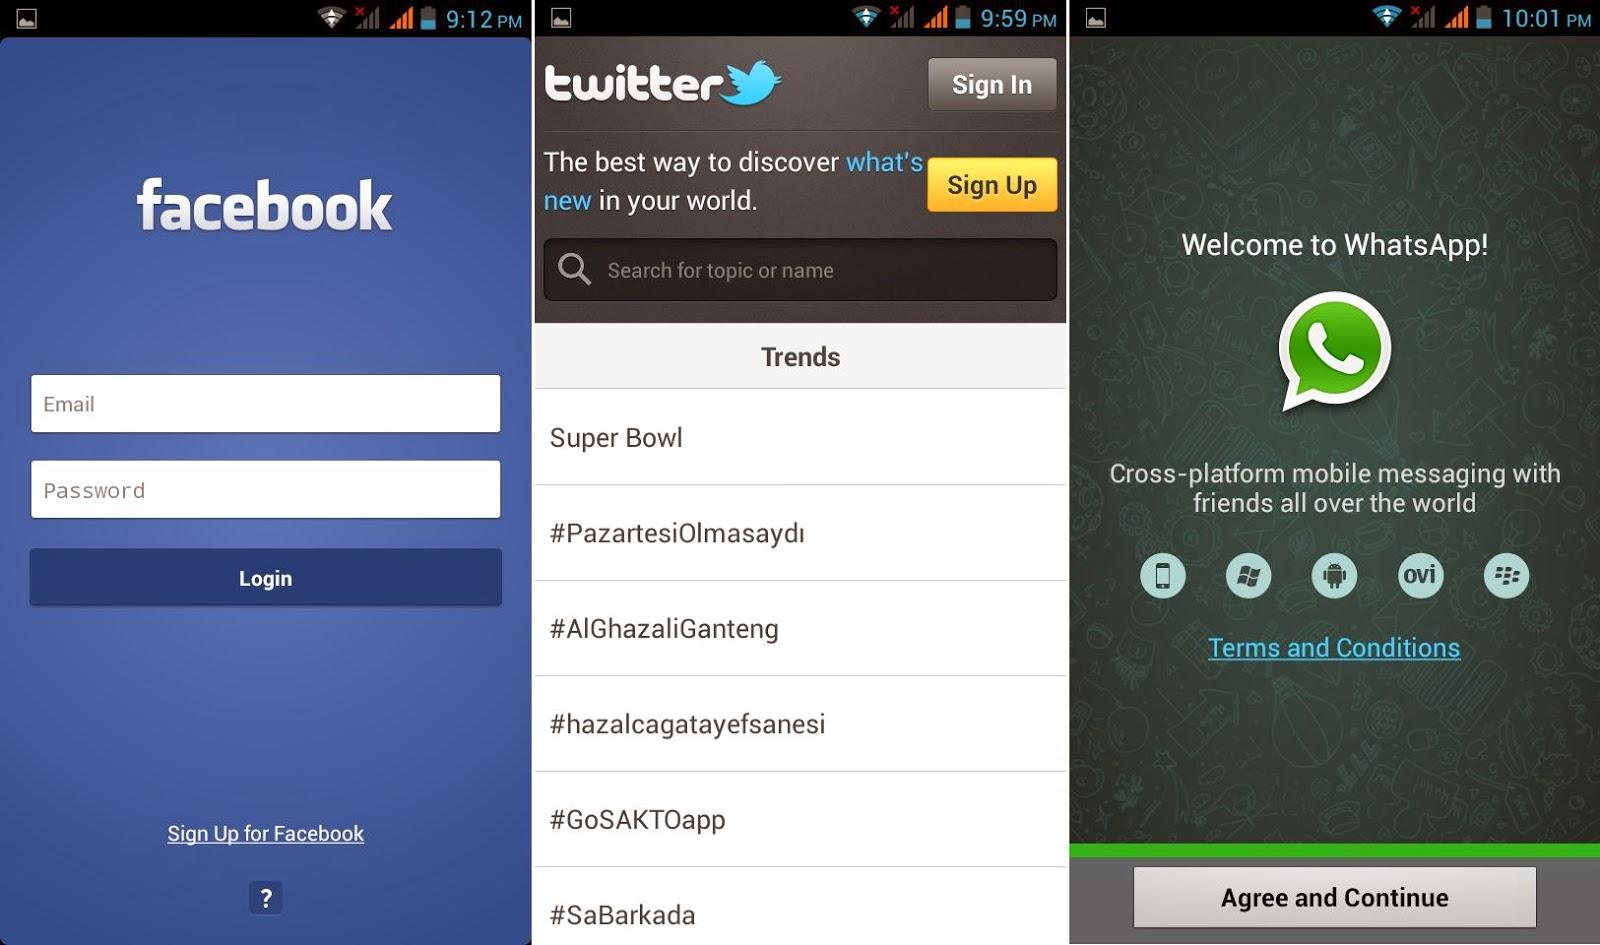 DTC Mobile GT15 Astroid Fiesta Facebook, Twitter & WhatsApp